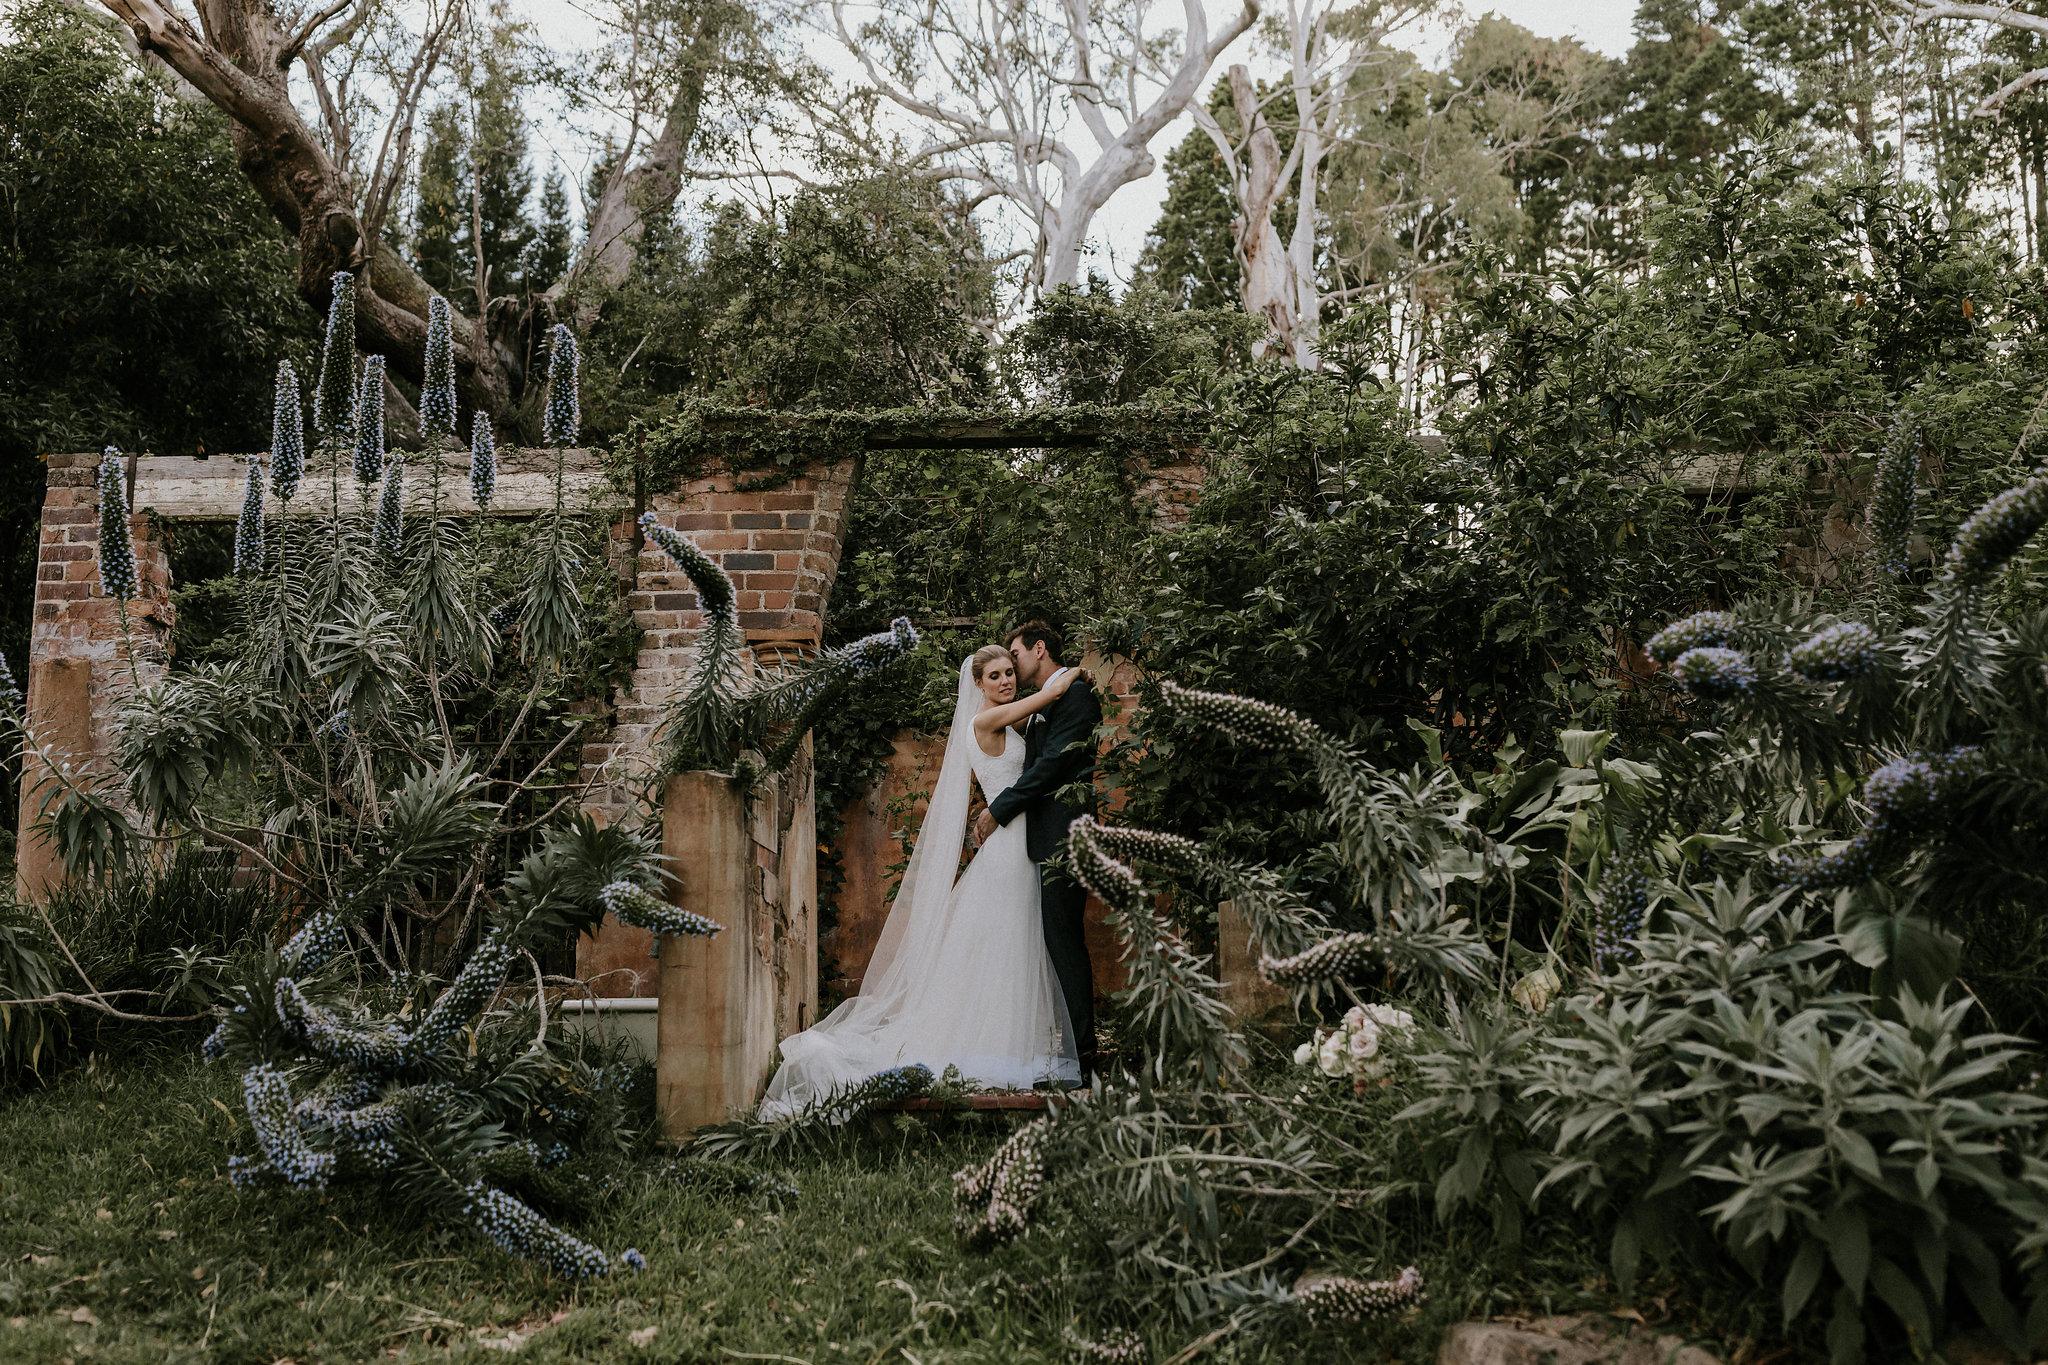 Hopewood House - Weddings - Constance & Nick - Shot 11 - Ruins n Botanicals.jpg